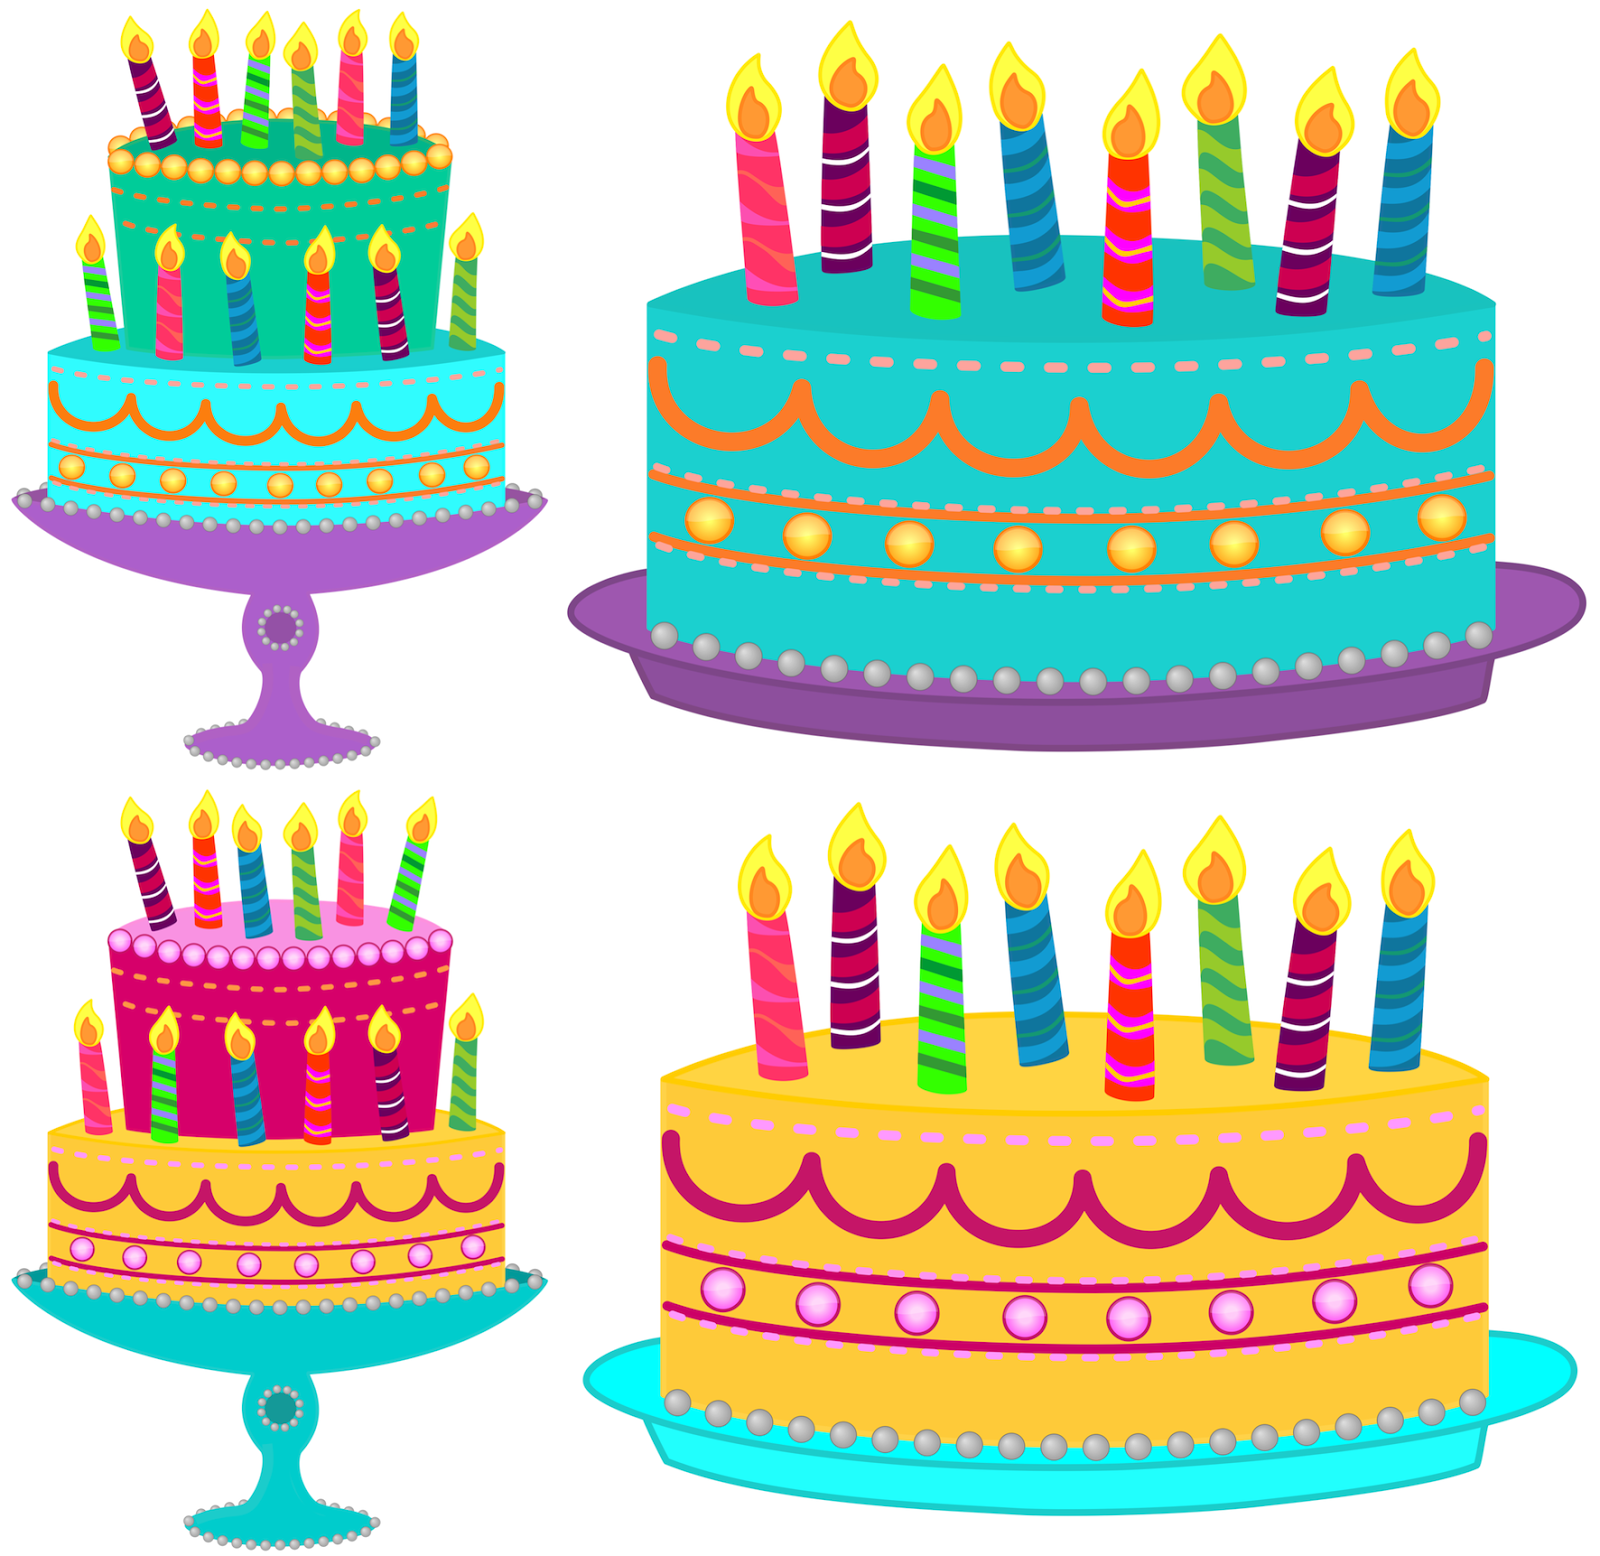 Birthday cake clipart jpg library stock 50 Birthday Cake Clipart - Clipart Kid jpg library stock